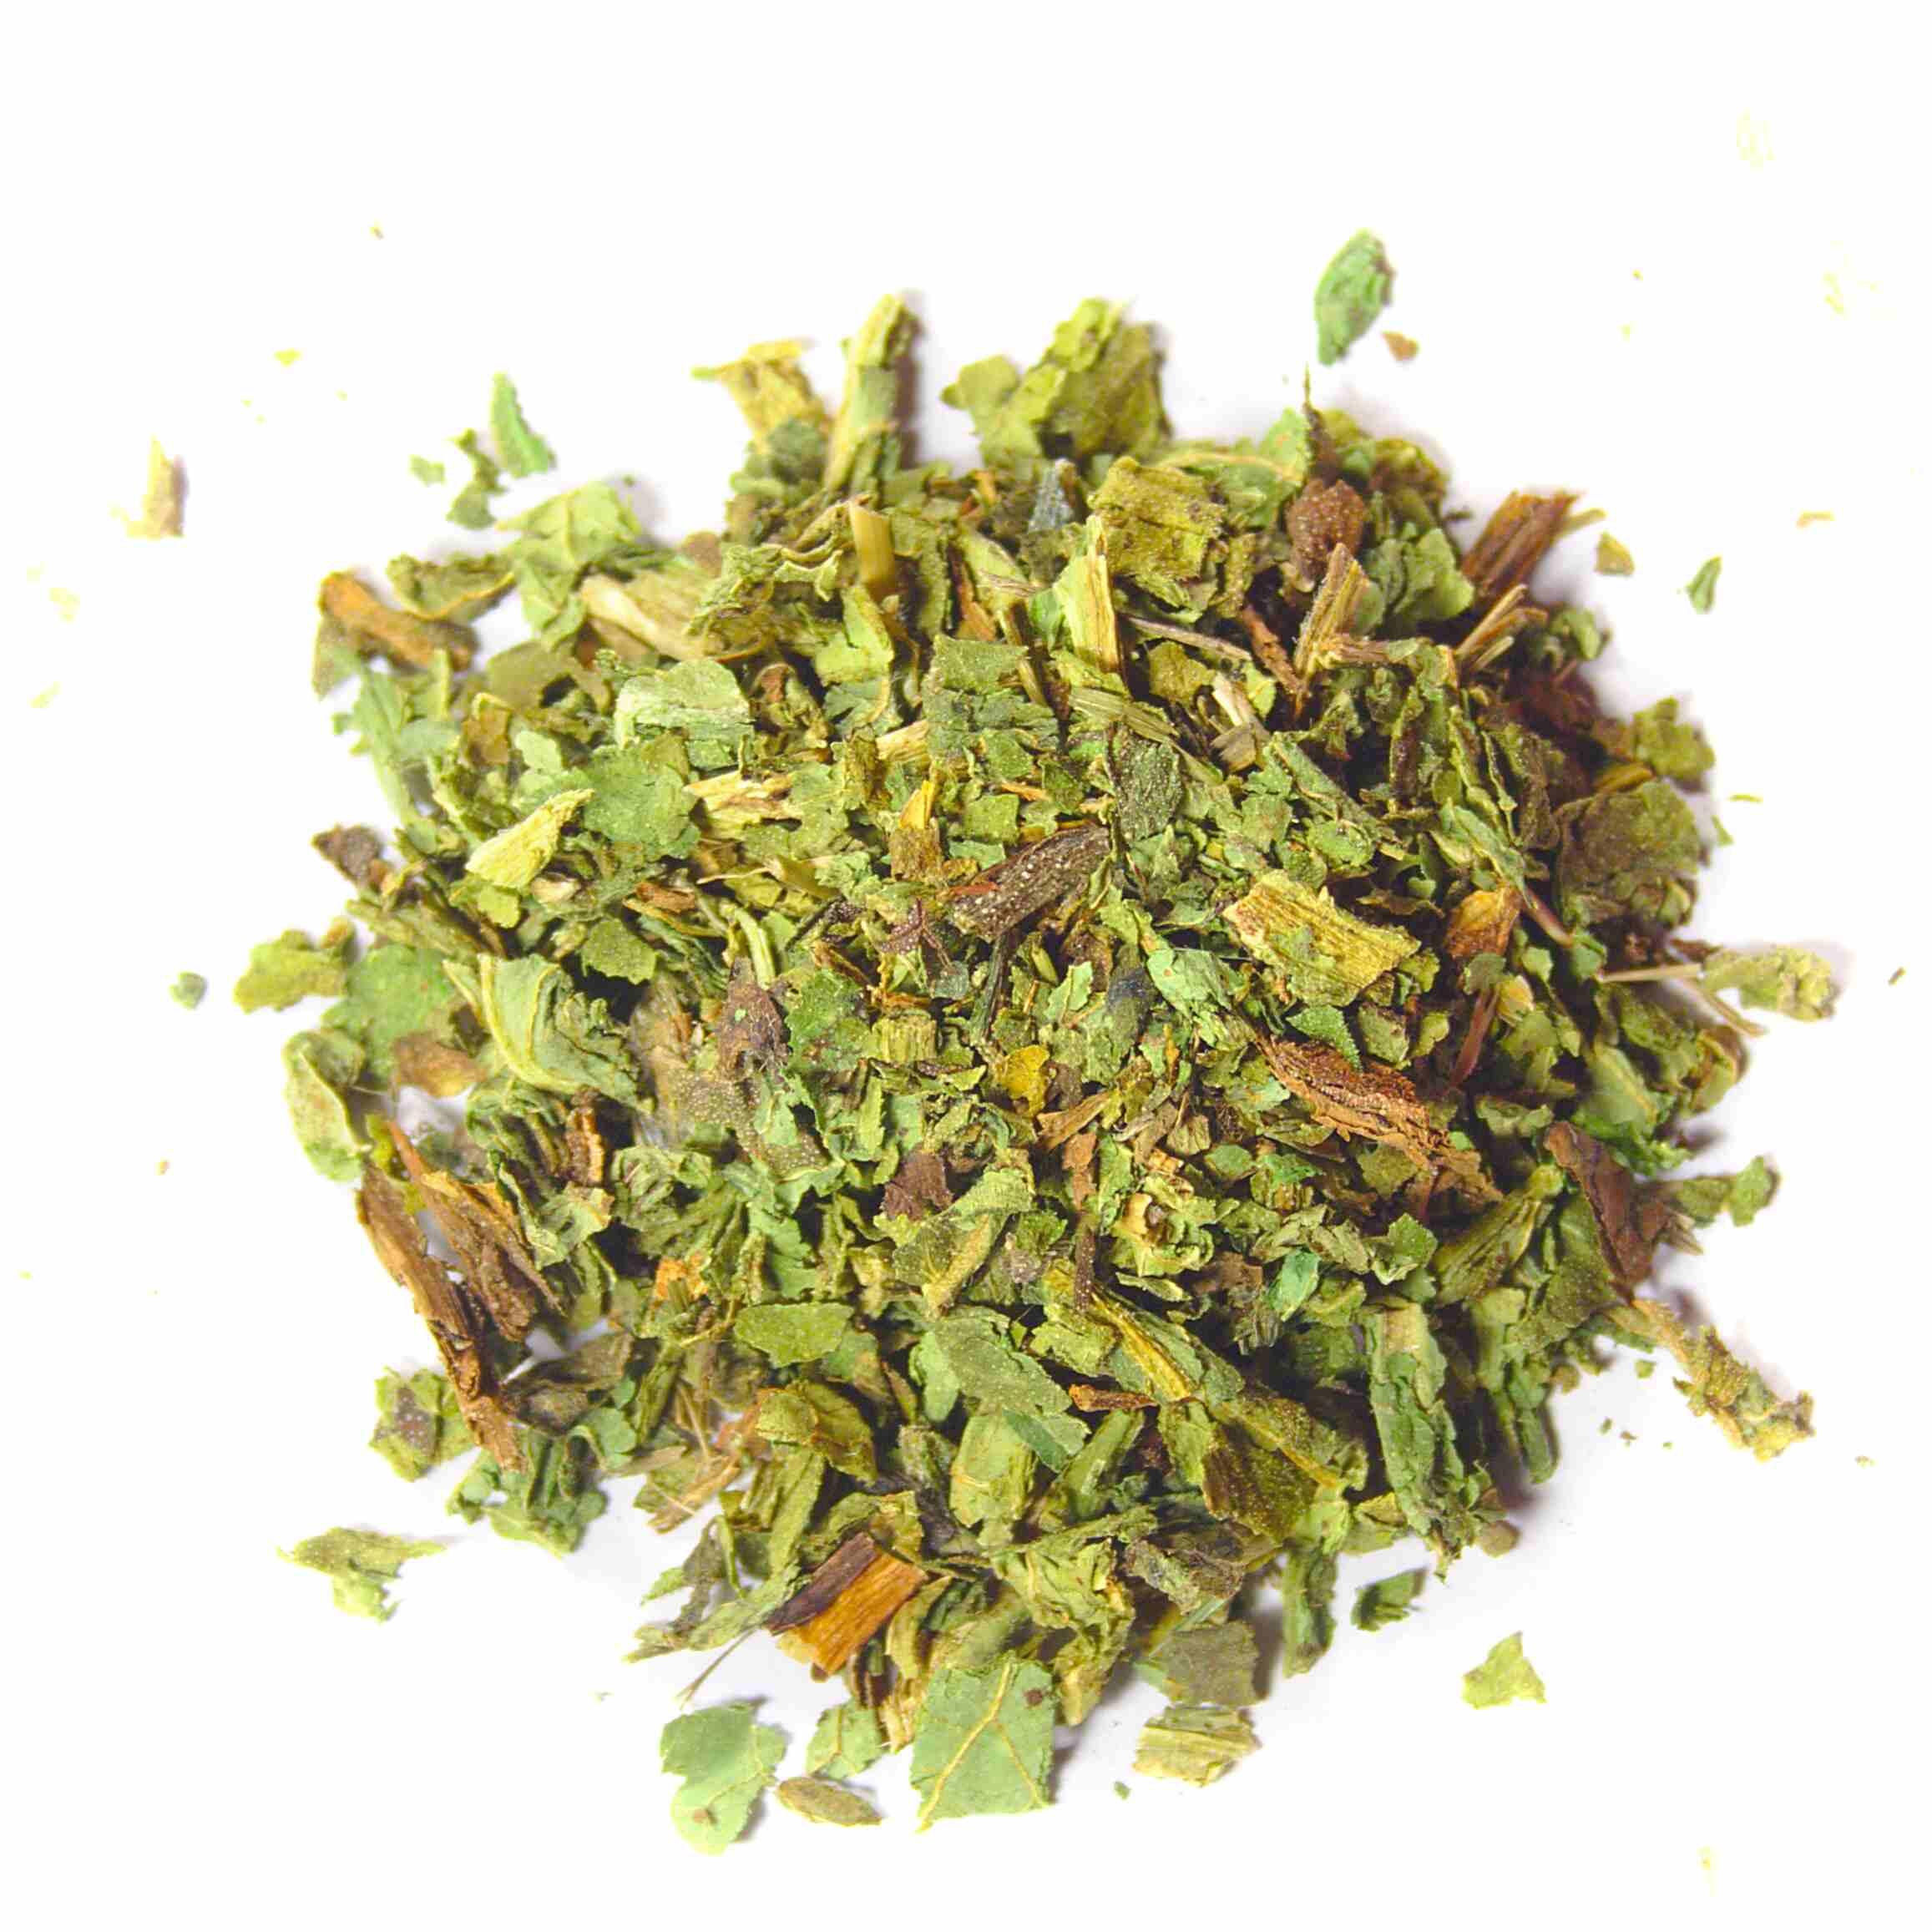 Bulk herbs spices organic organic herbal tea - Organic Comfrey Herb Bulk 250g